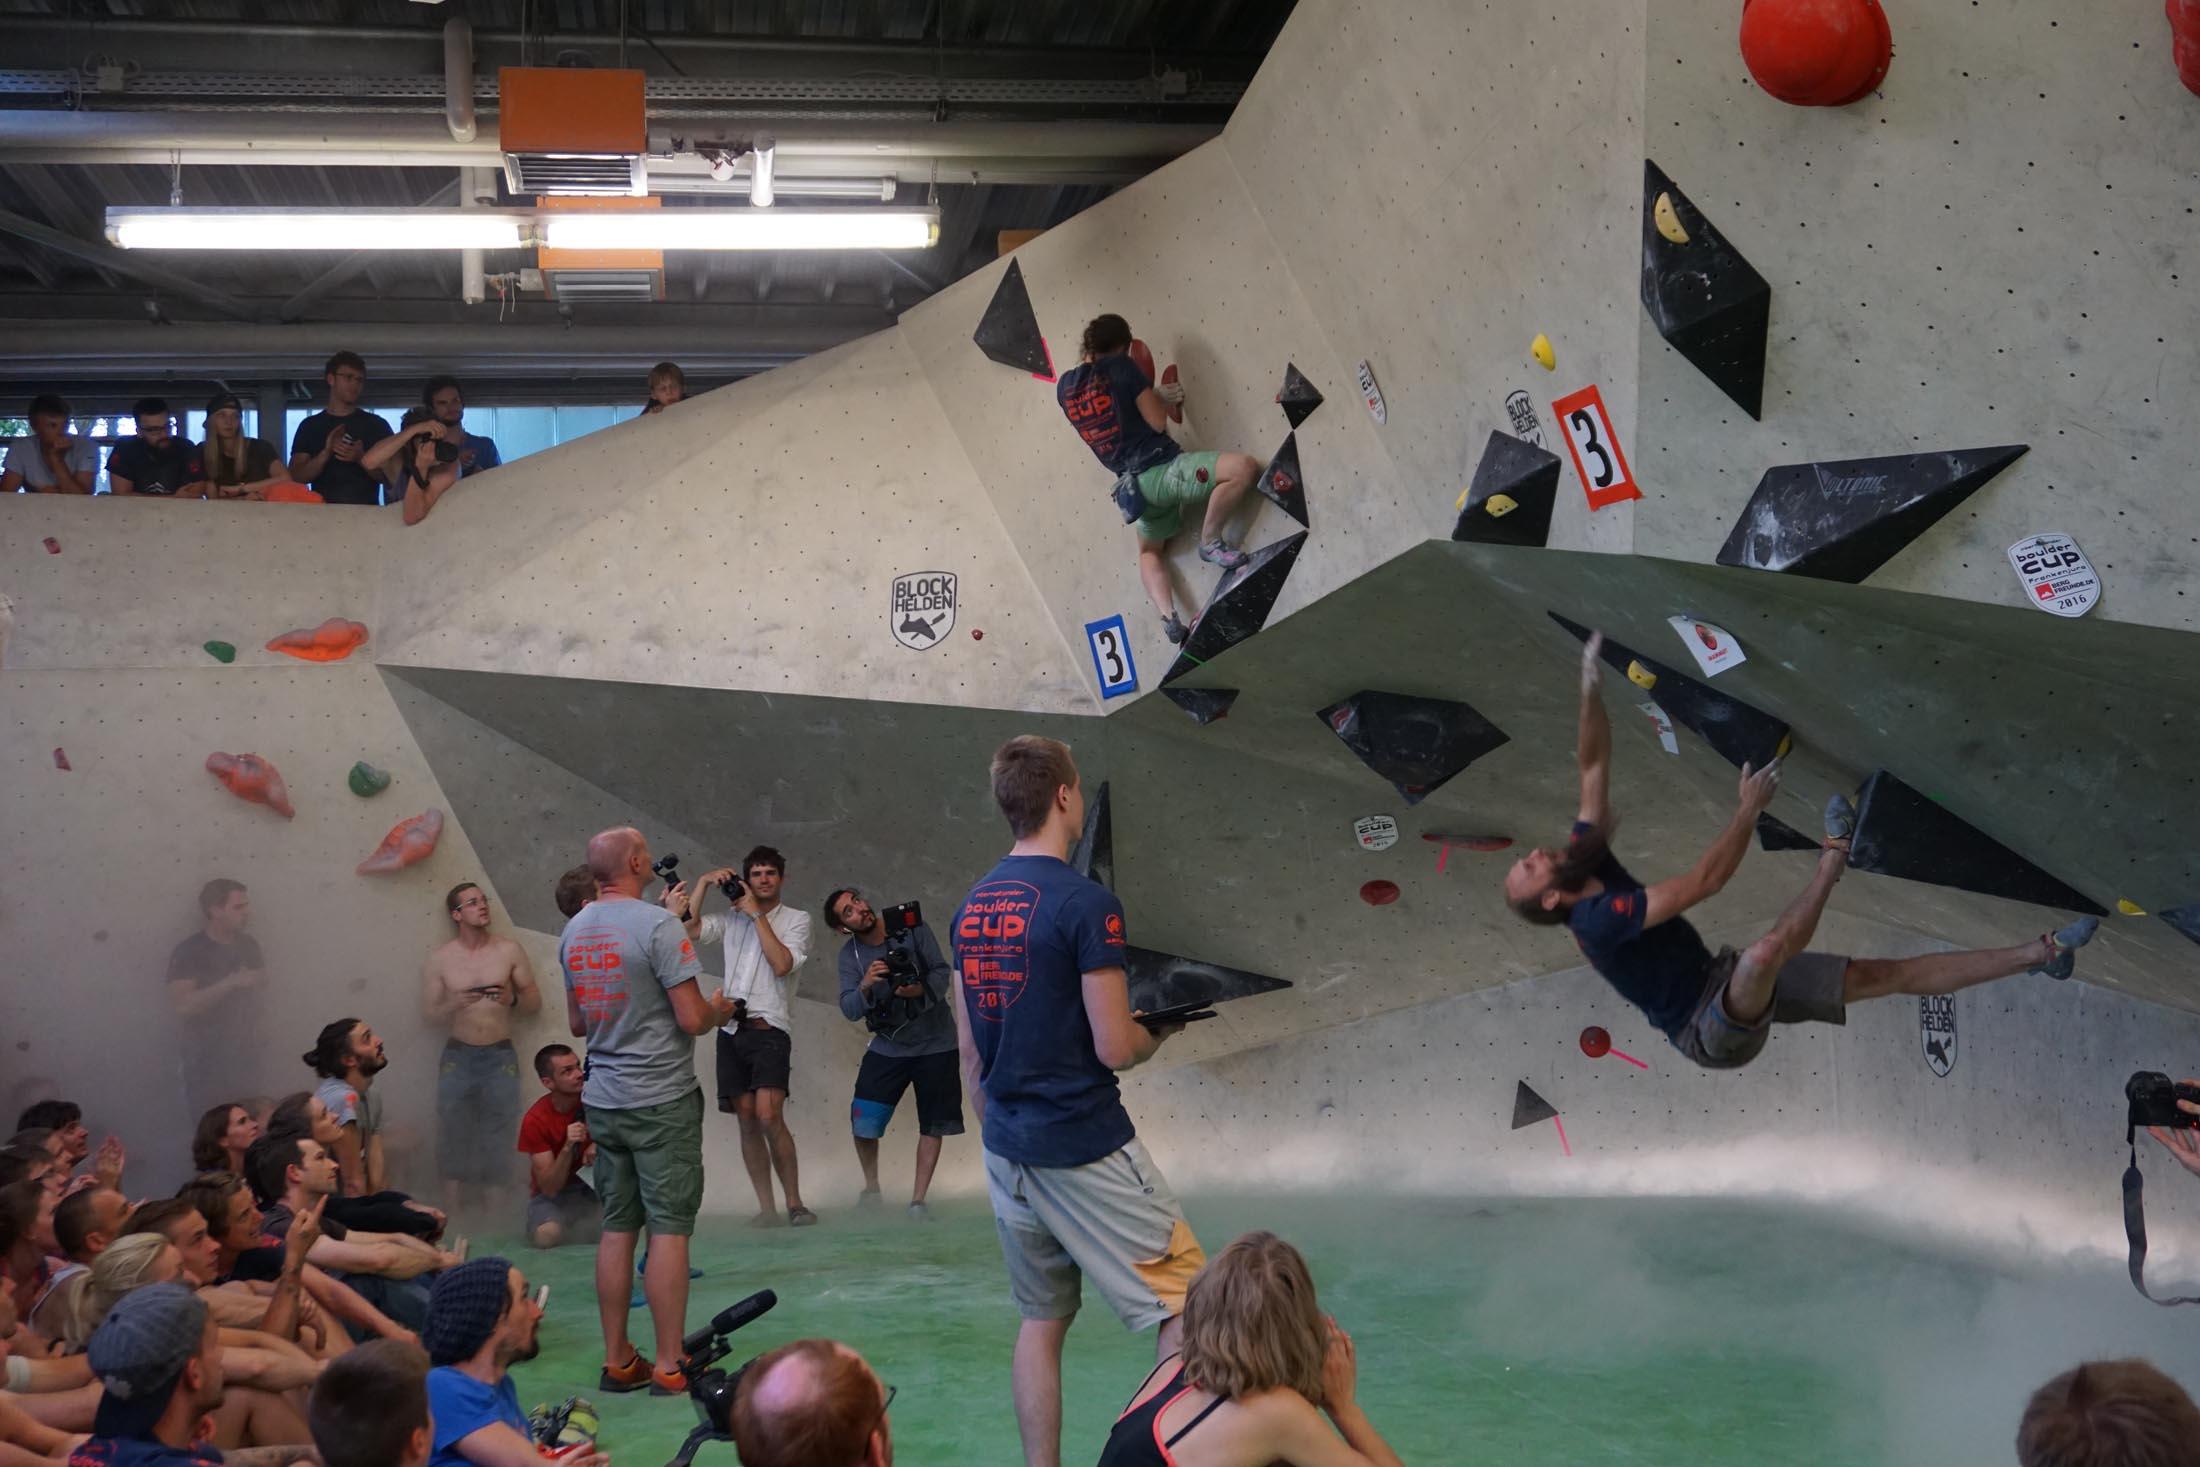 Finale, internationaler bouldercup Frankenjura 2016, BLOCKHELDEN Erlangen, Mammut, Bergfreunde.de, Boulderwettkampf07092016702